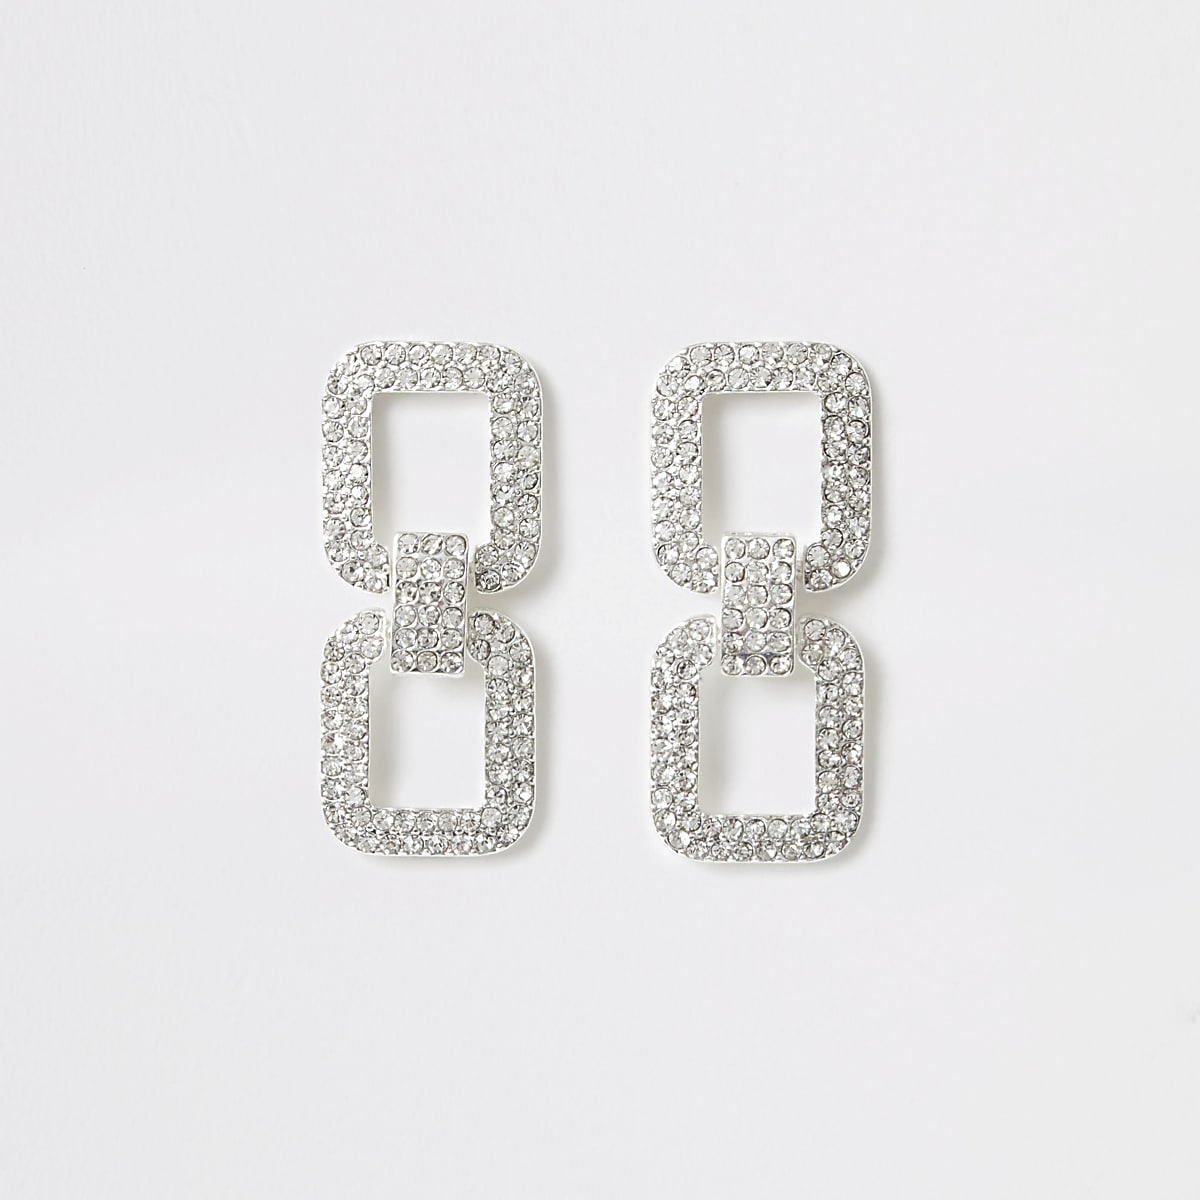 Silver color rhinestone rectangle drop earring